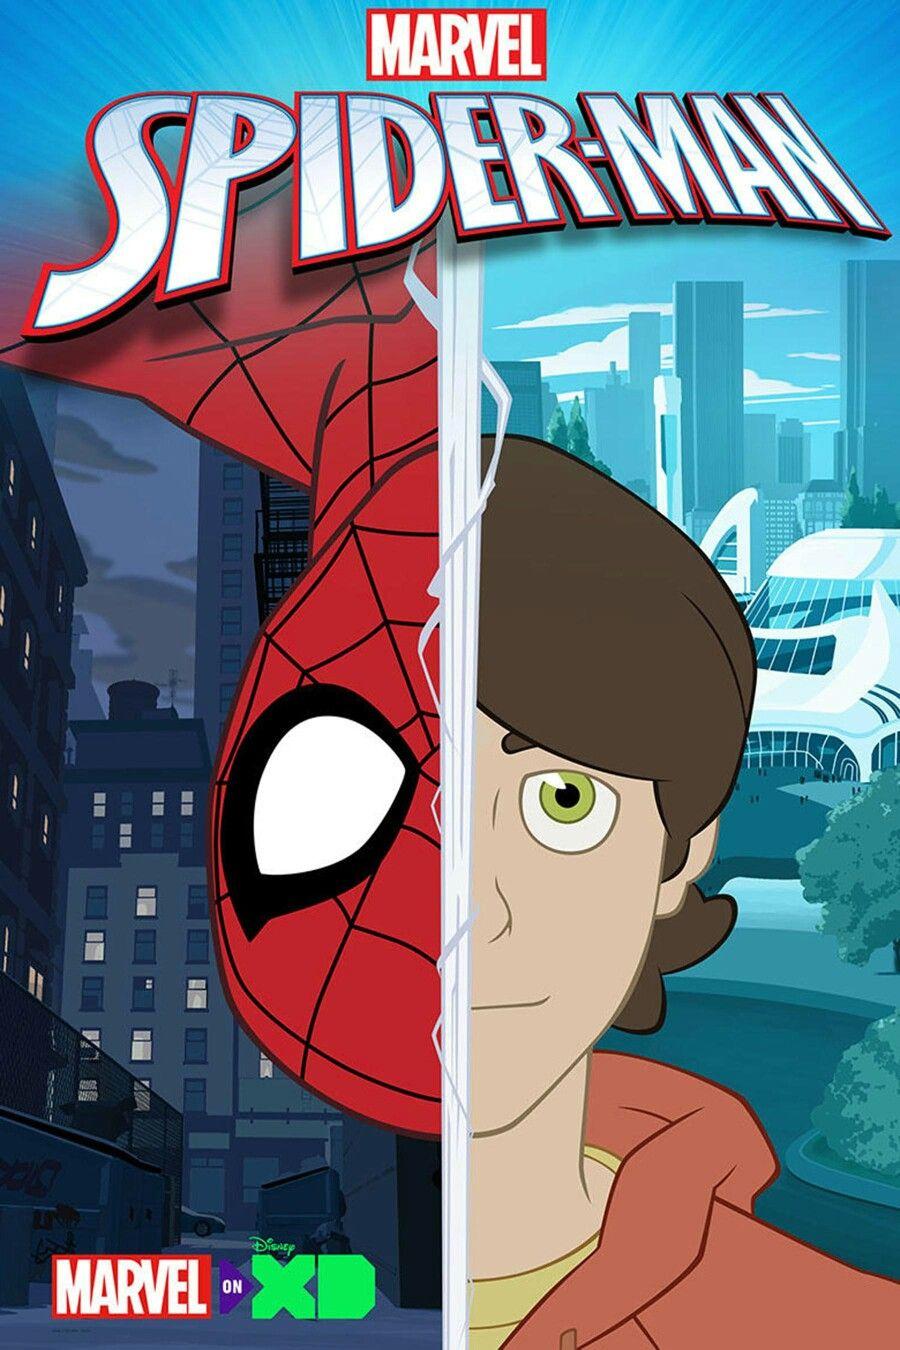 Pin By Priscila On Cartoon Spiderman Cartoon Spider Man Animated Series Ultimate Spiderman